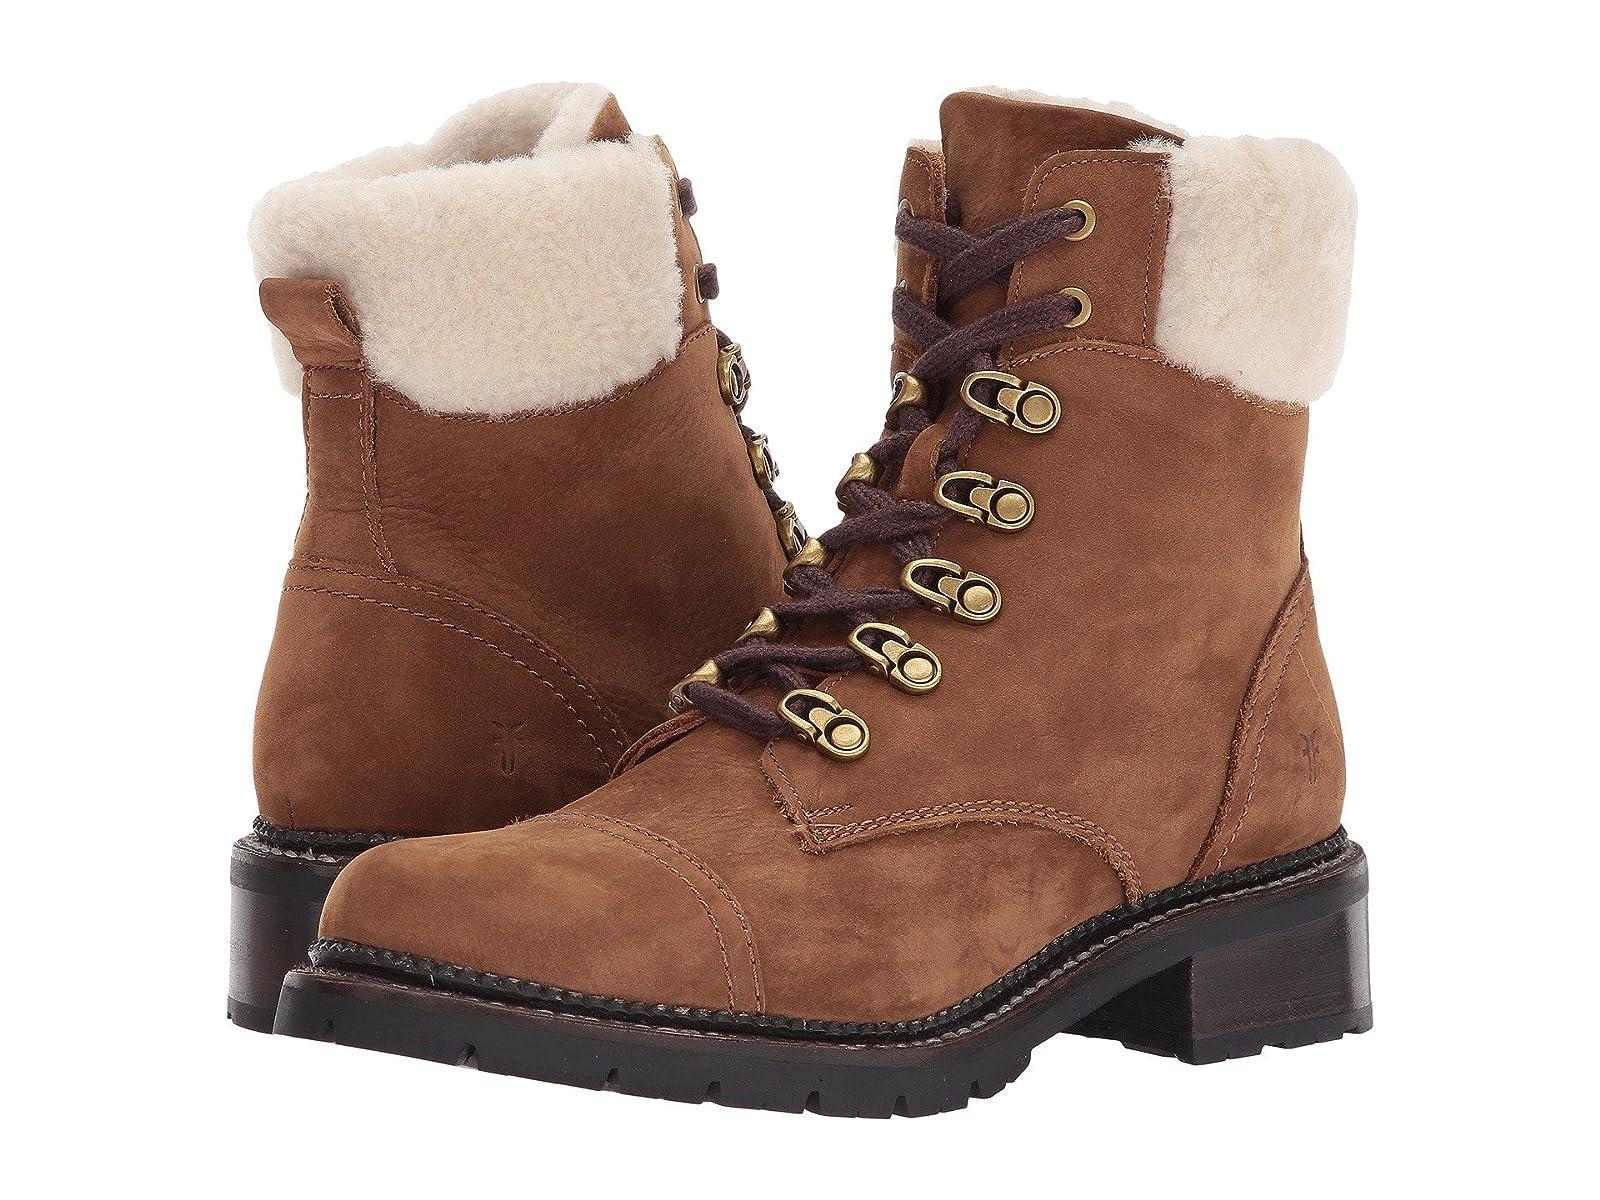 Frye Samantha HikerCheap and distinctive eye-catching shoes